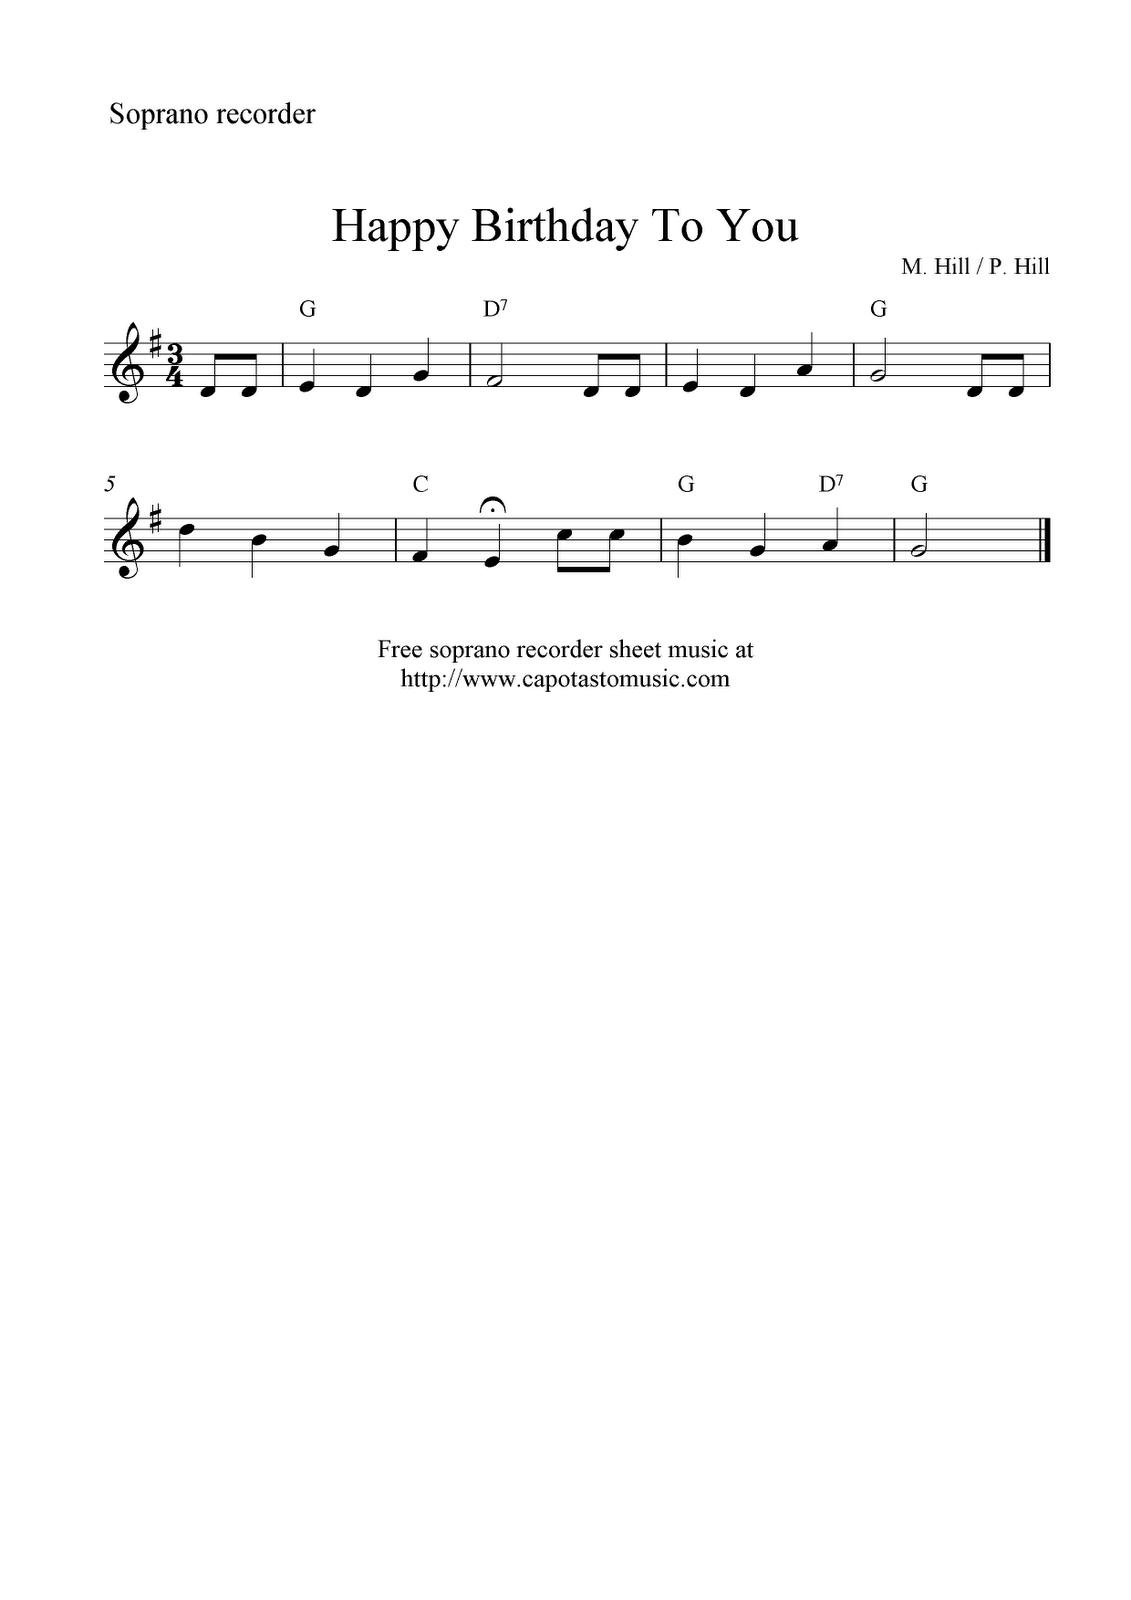 Free Sheet Music Scores Happy Birthday To You Free Soprano Recorder Sheet Music Notes